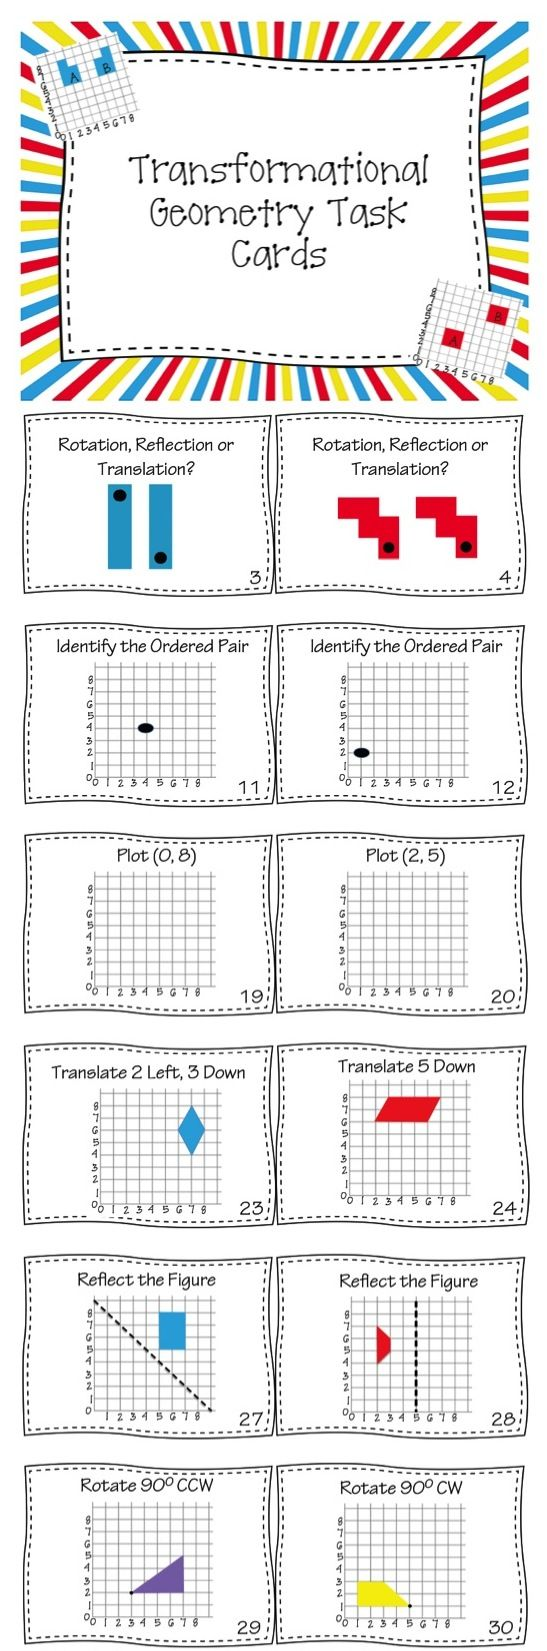 Transformational Geometry Task Cards Geometry Task Cards Task Cards Teaching Math [ 1651 x 547 Pixel ]